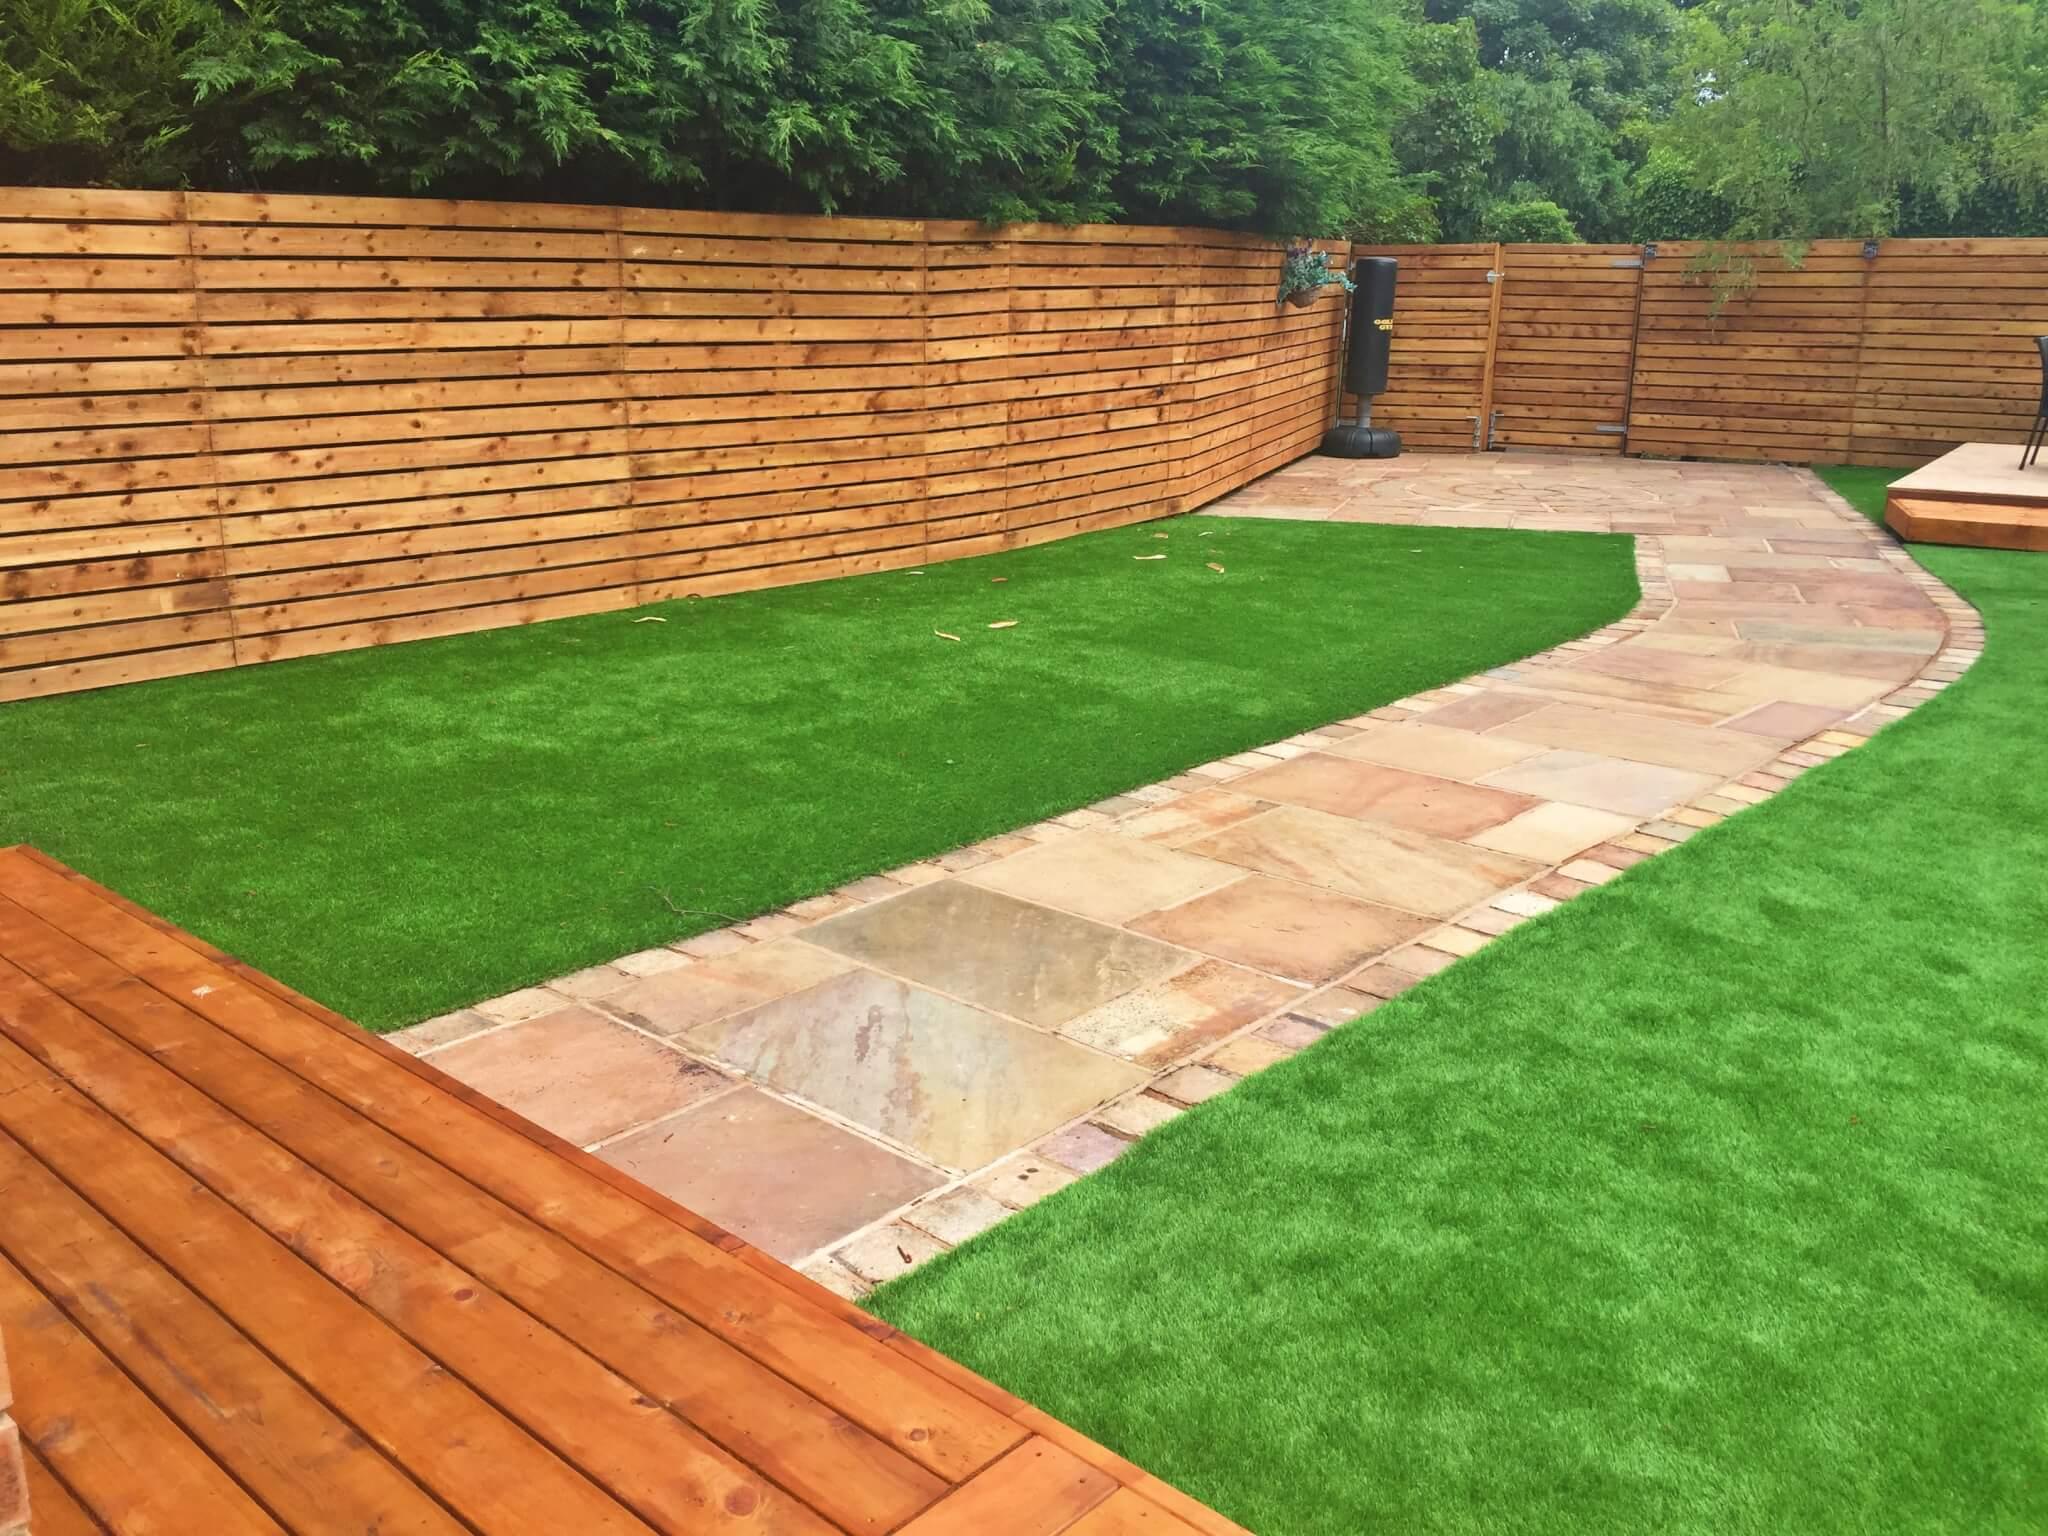 Timber decking artificial grass contemporary fencing for Garden decking with artificial grass